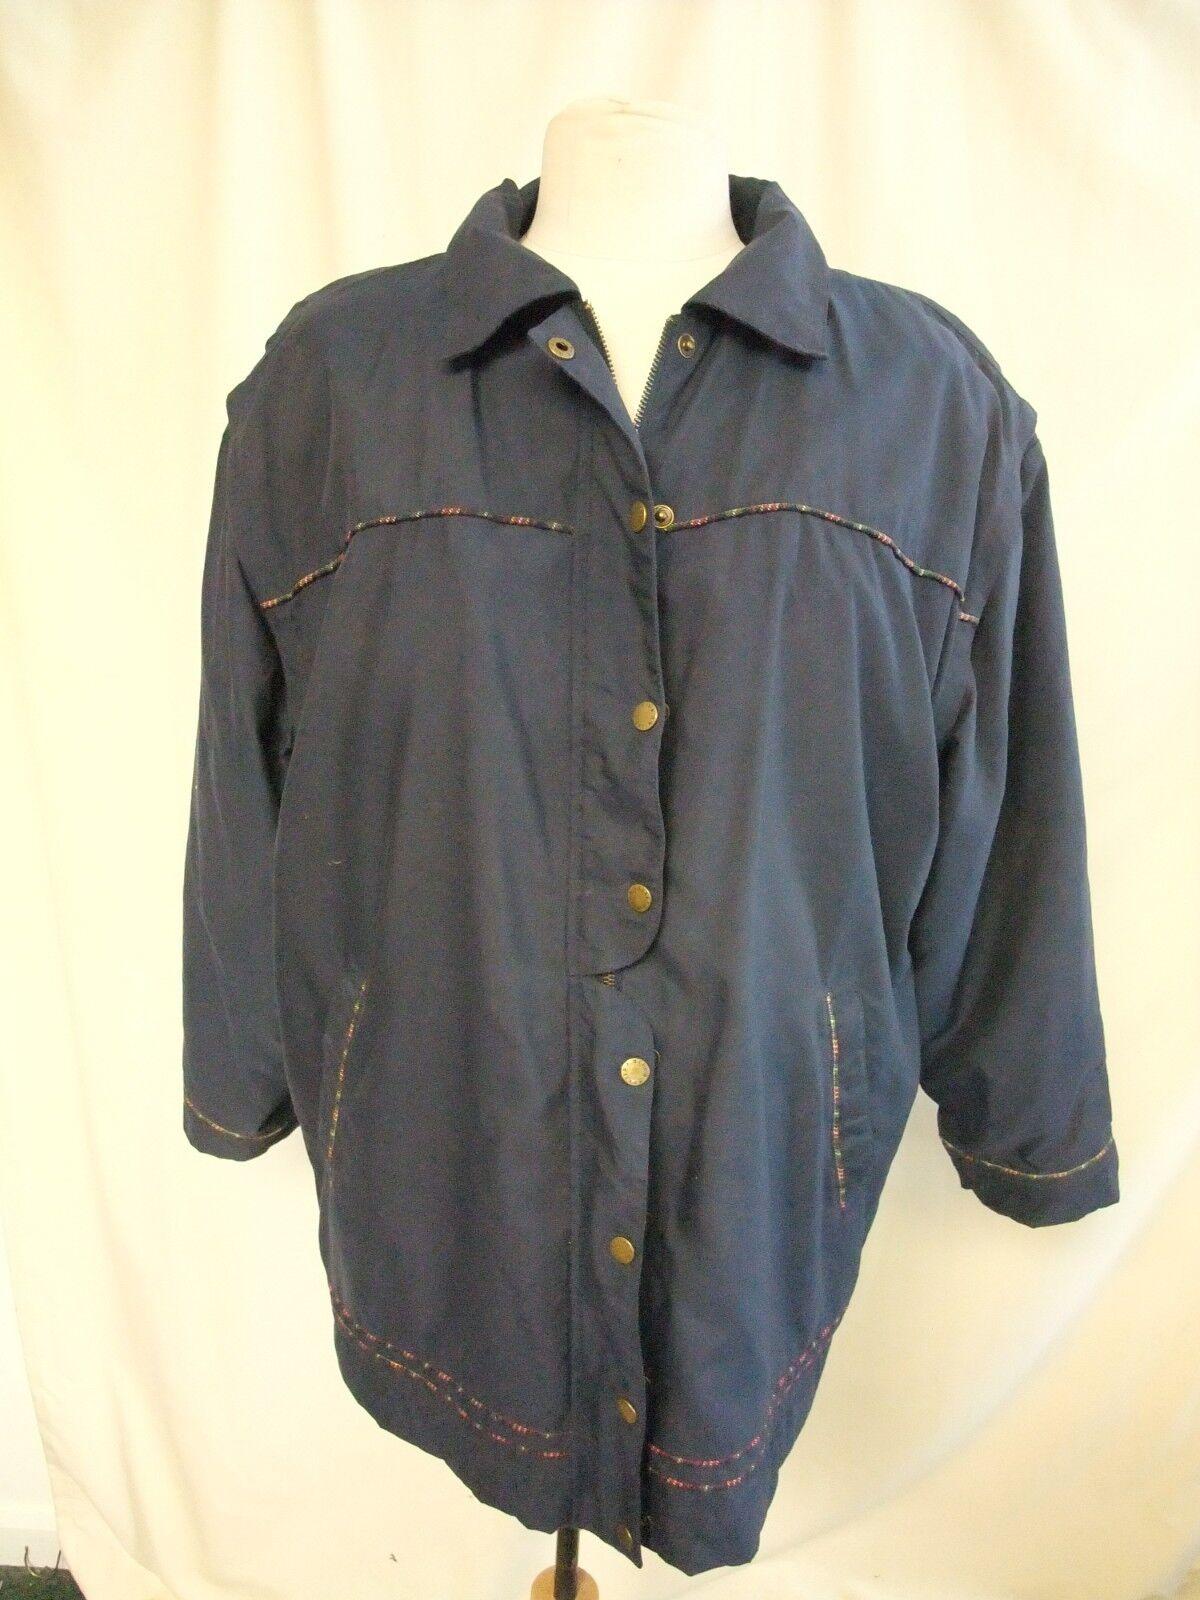 Ladies Coat Alice Collins size M, navy, fleece lining, detachable sleeves 7955